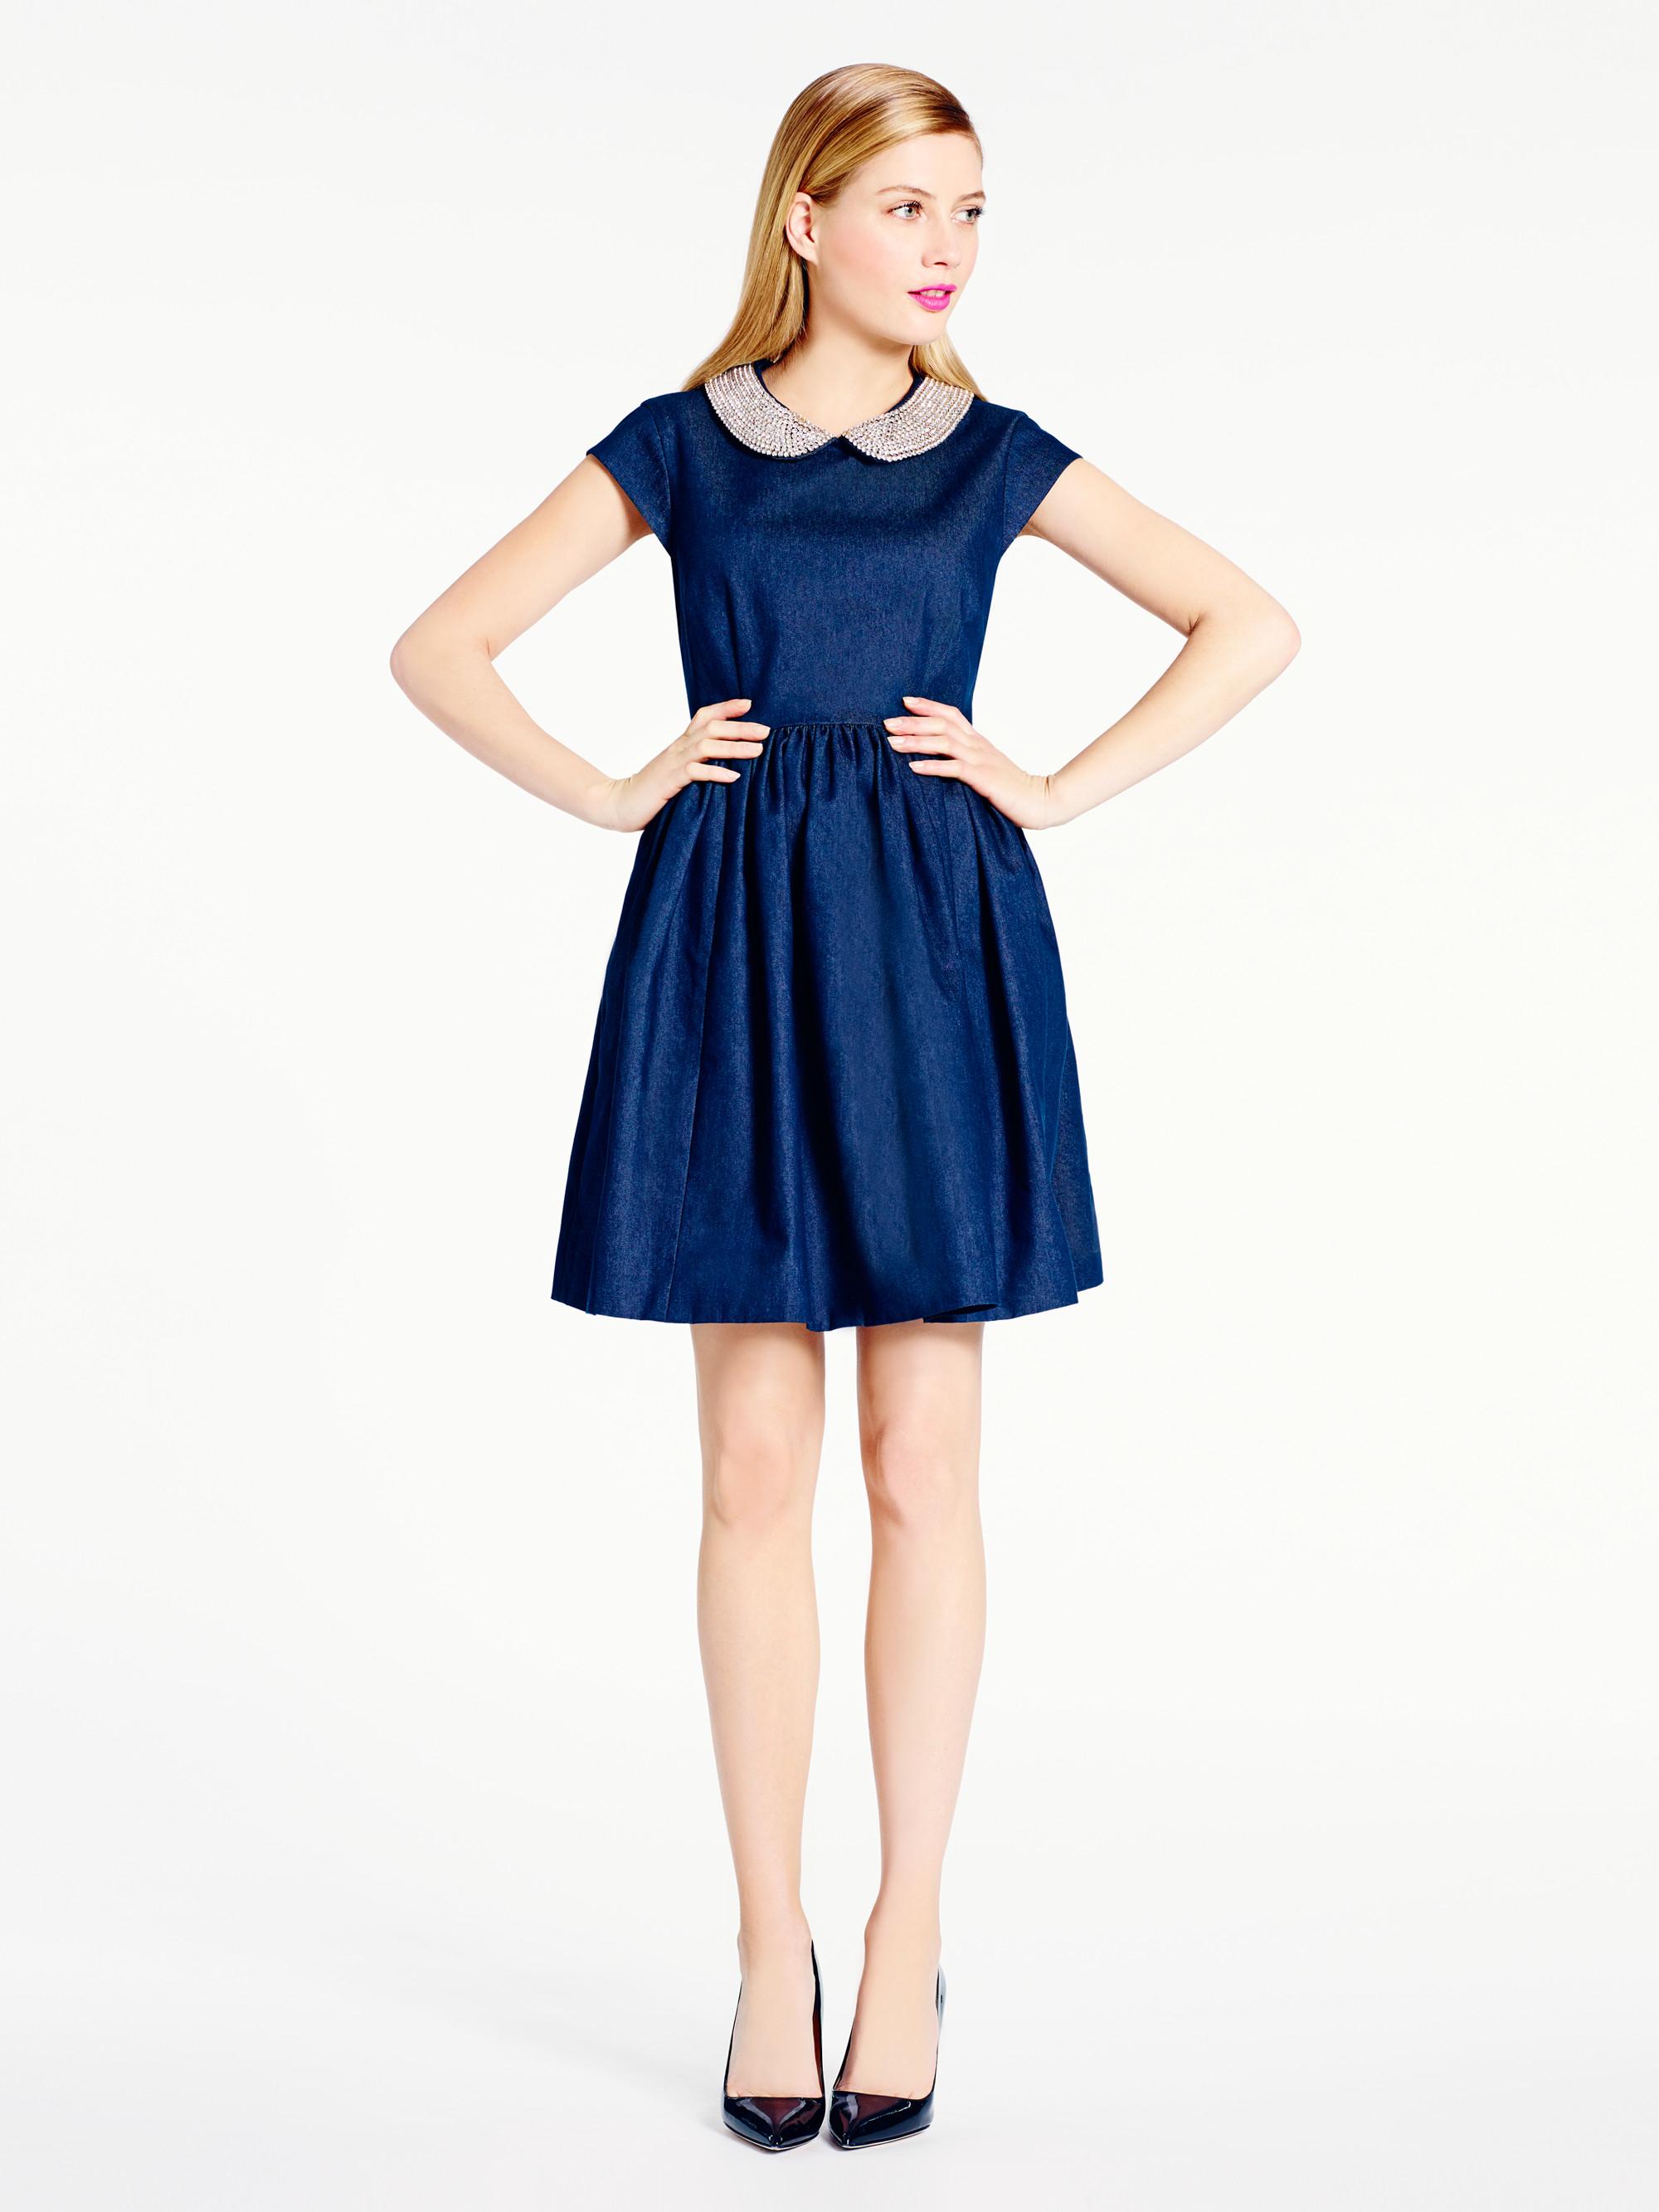 Lyst Kate Spade New York Denim Kimberly Dress In Blue